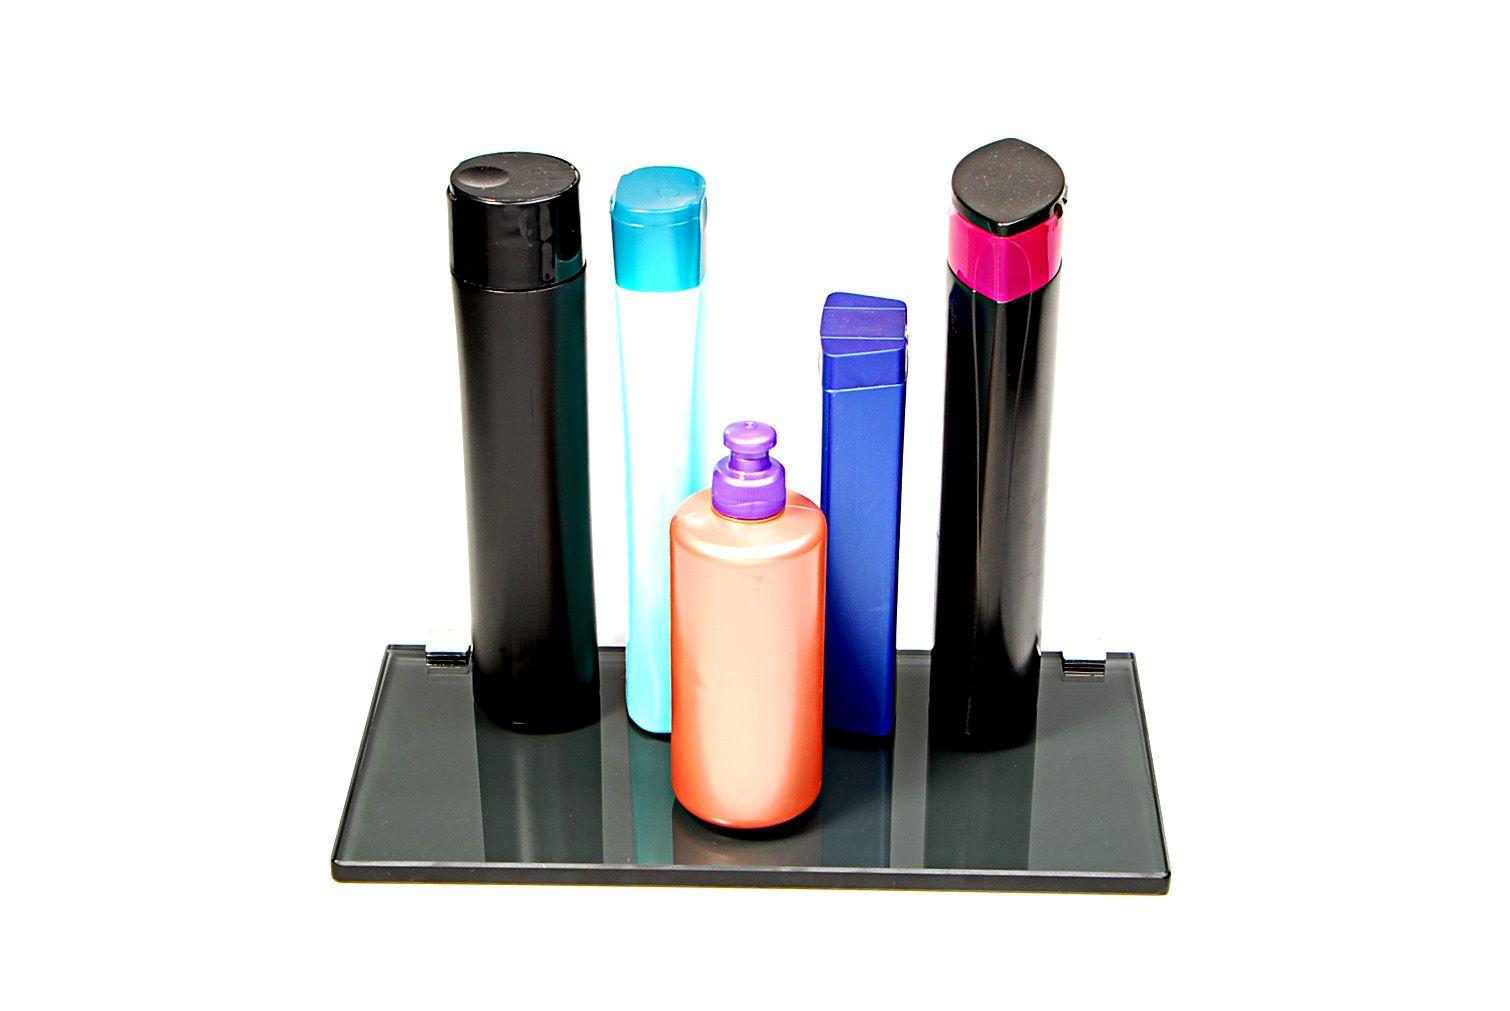 Porta Shampoo Reto em Vidro Fumê Lapidado - Aquabox  - 30cmx14cmx10mm